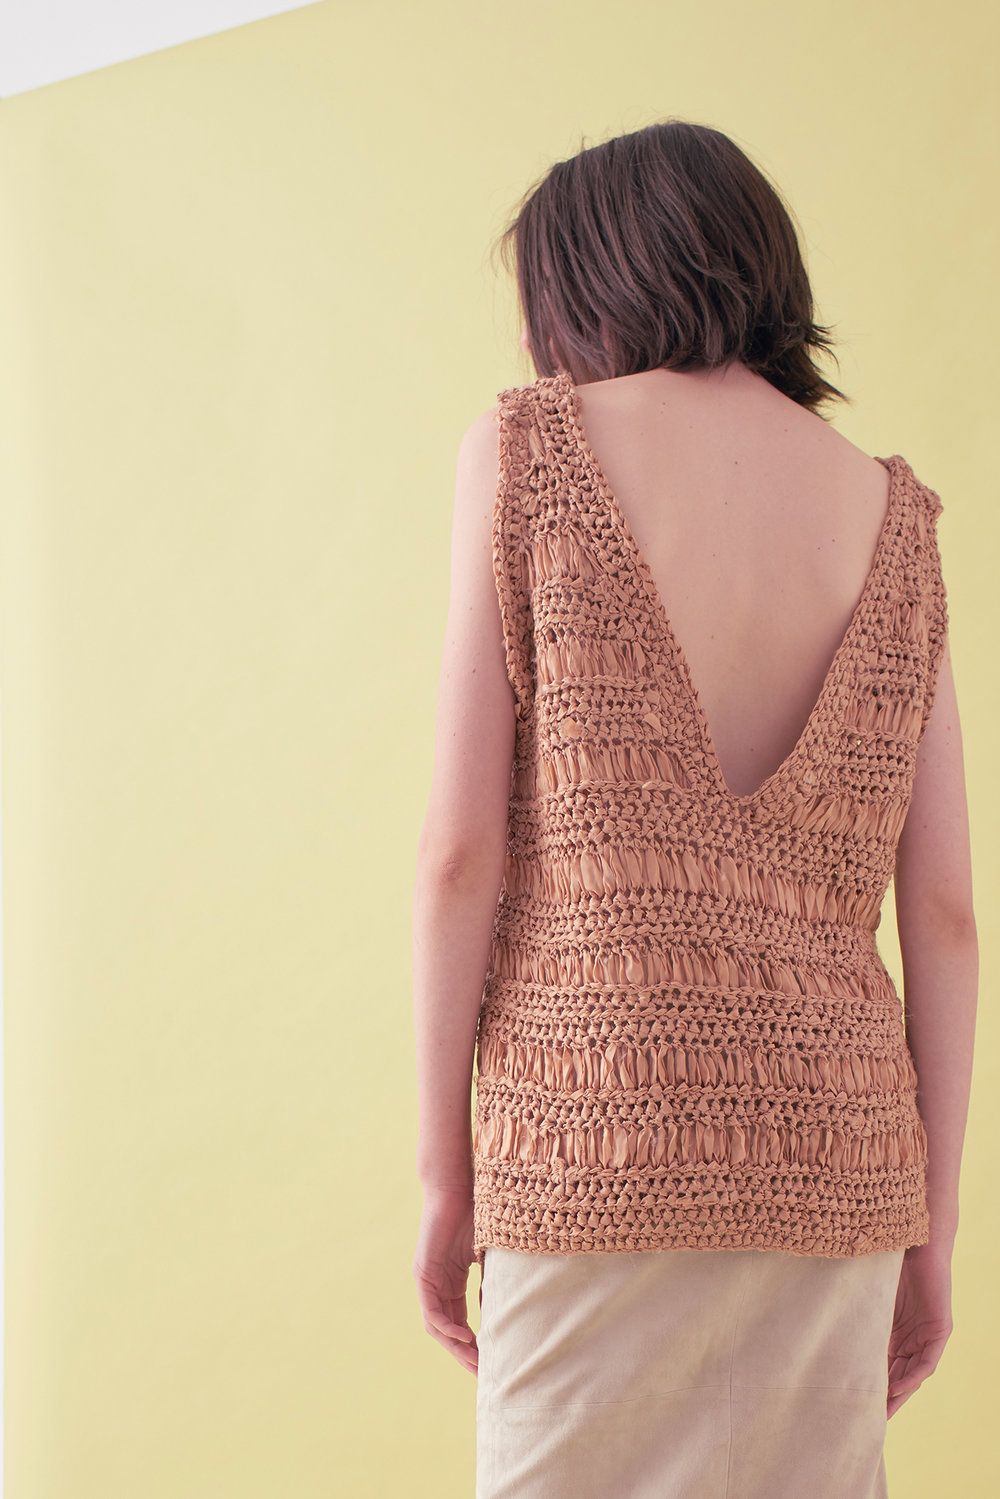 Sarah_Swann_SS17_12_Ribbon_Hand_Crochet_V-neck_Vest_Cosmetic_B.jpg